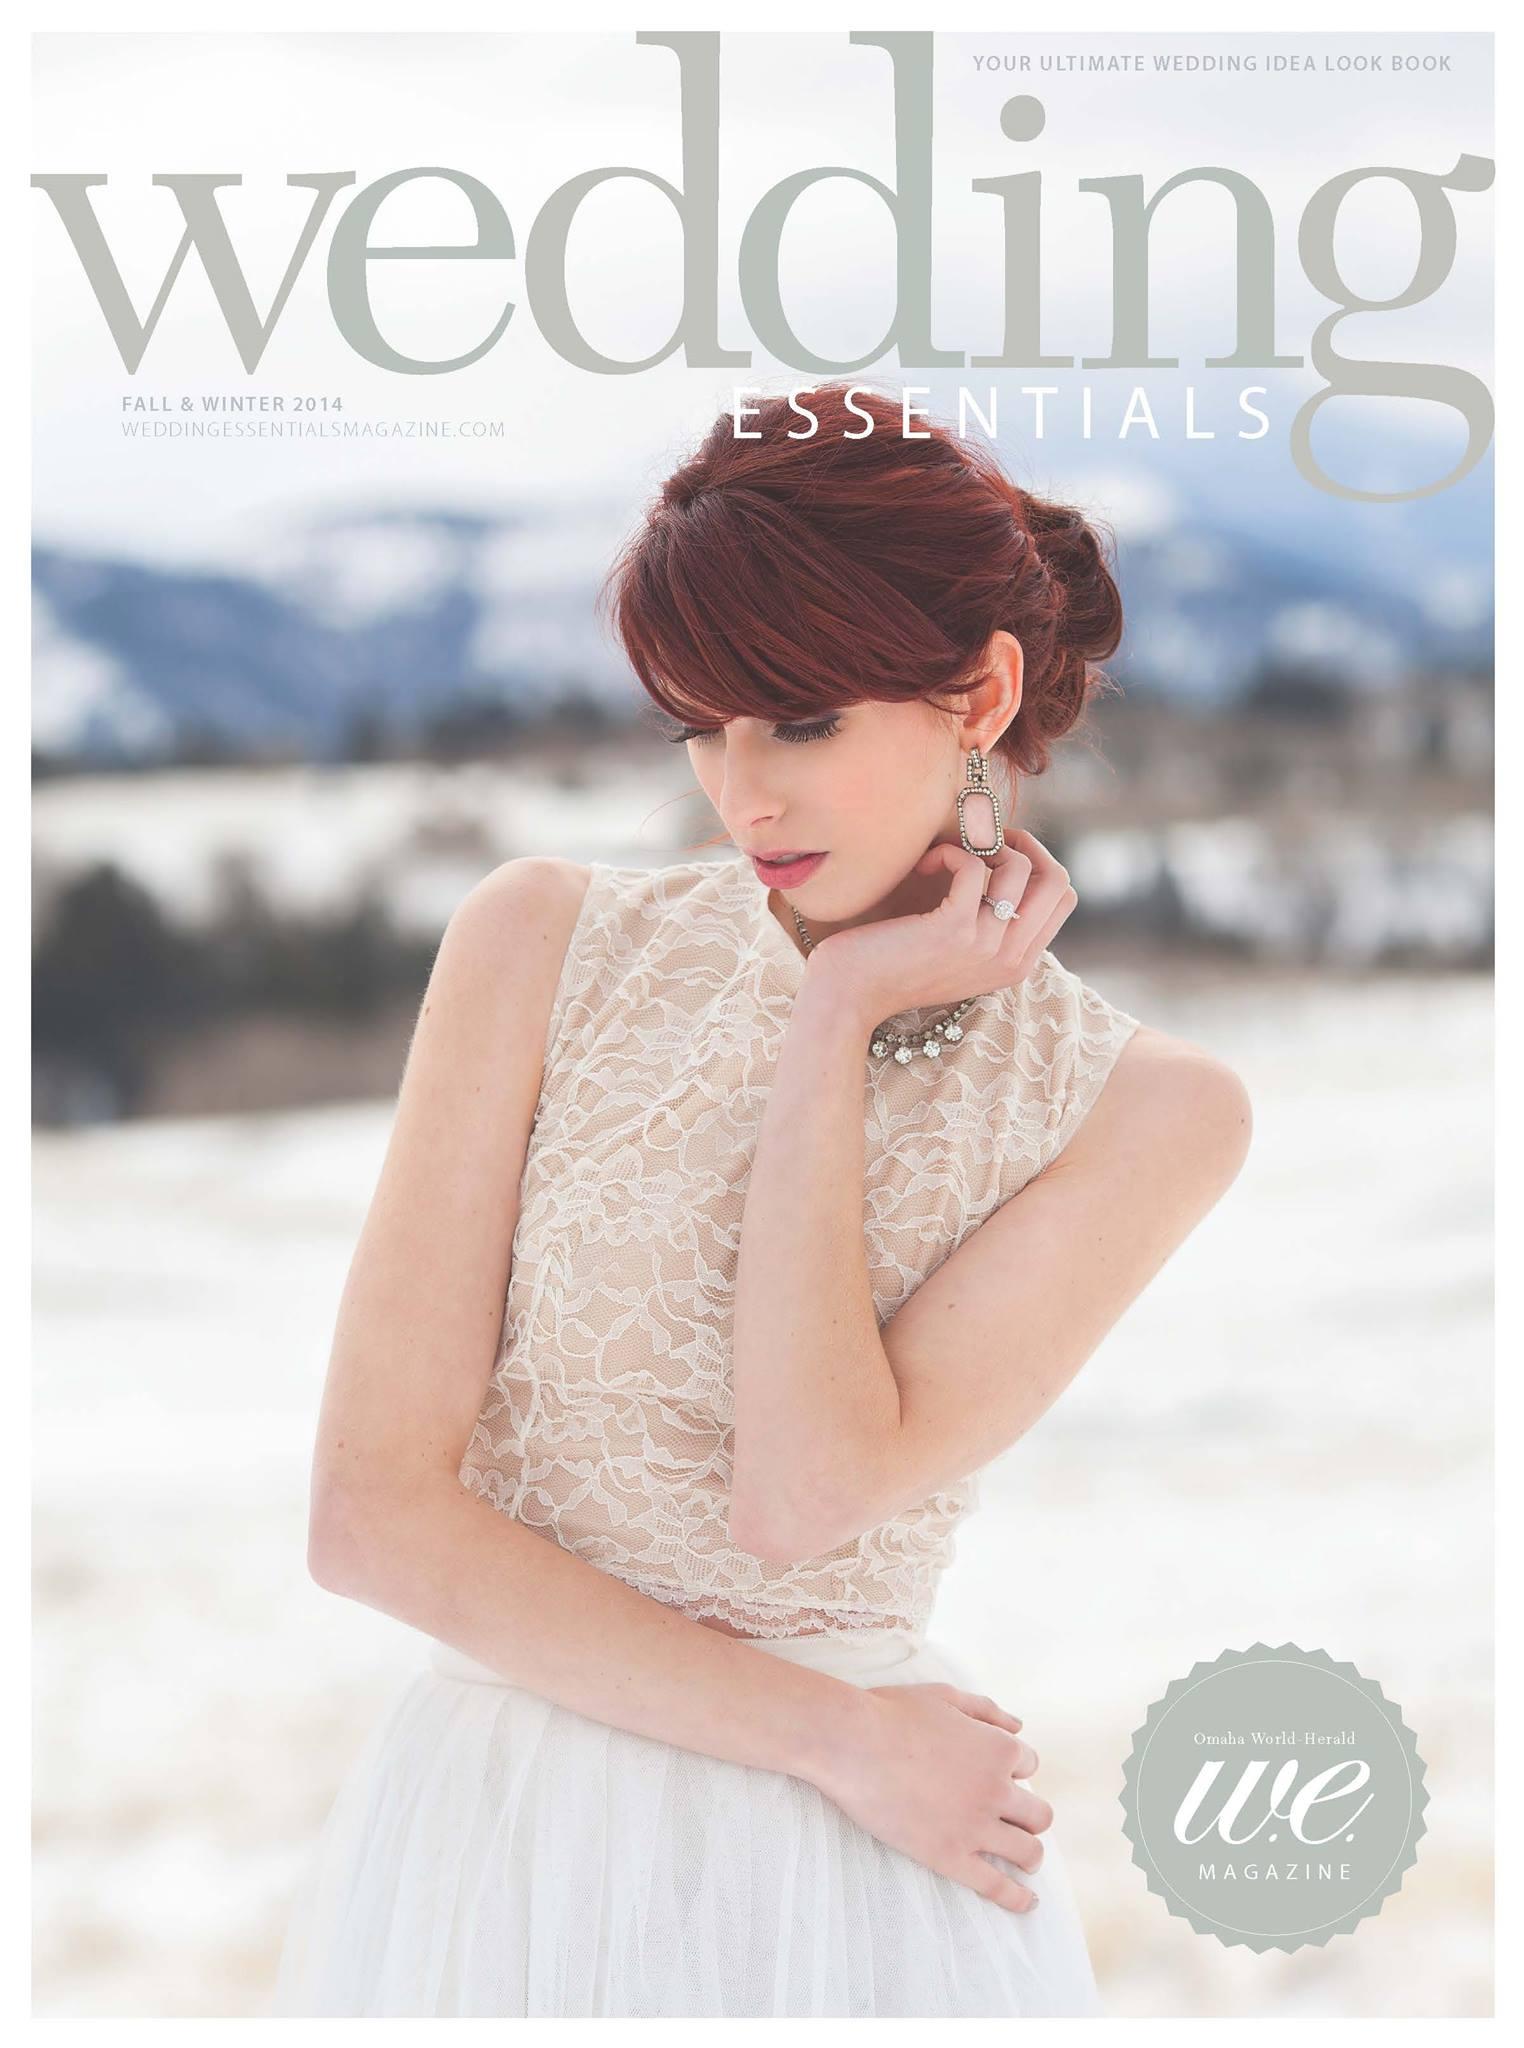 inspired living wedding crop lace top.jpg